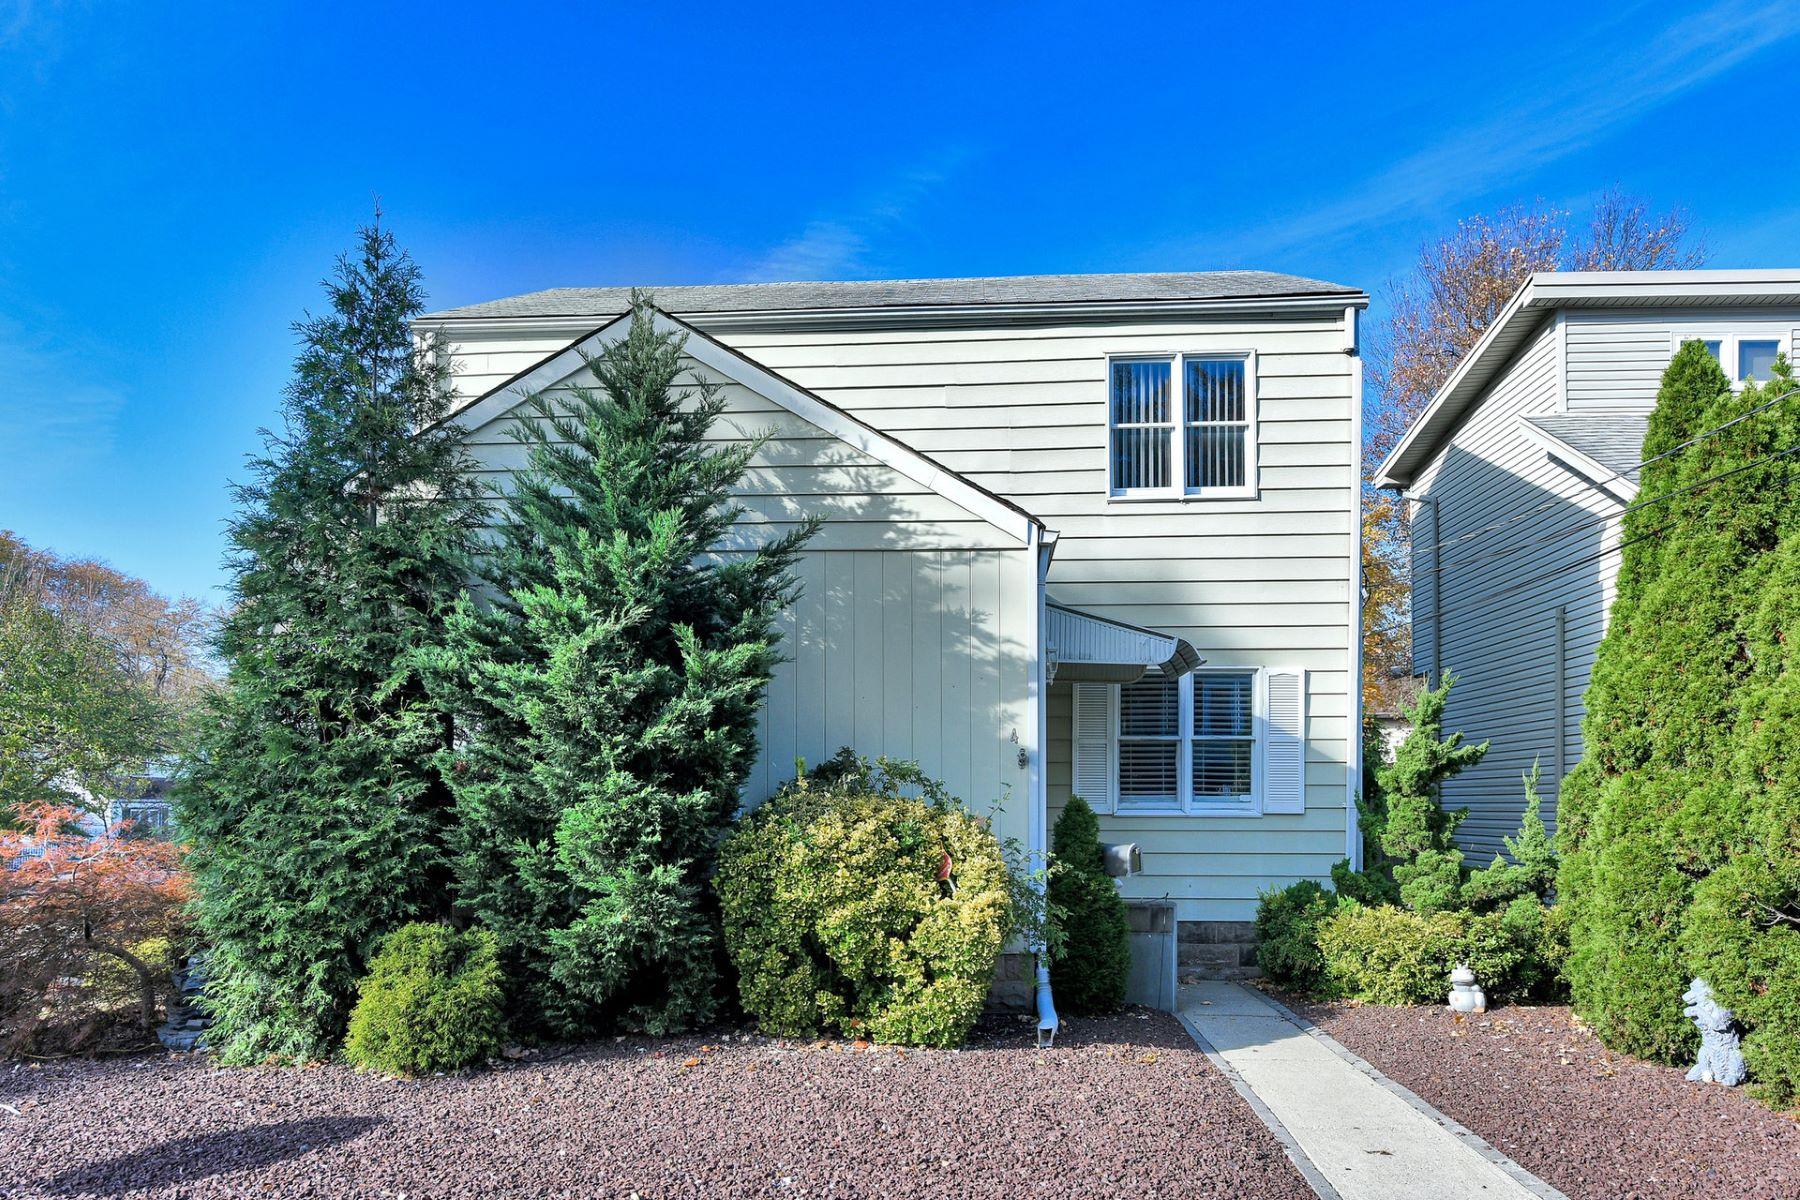 Single Family Homes для того Продажа на Patton Place 4 Patton Pl, Dumont, Нью-Джерси 07628 Соединенные Штаты